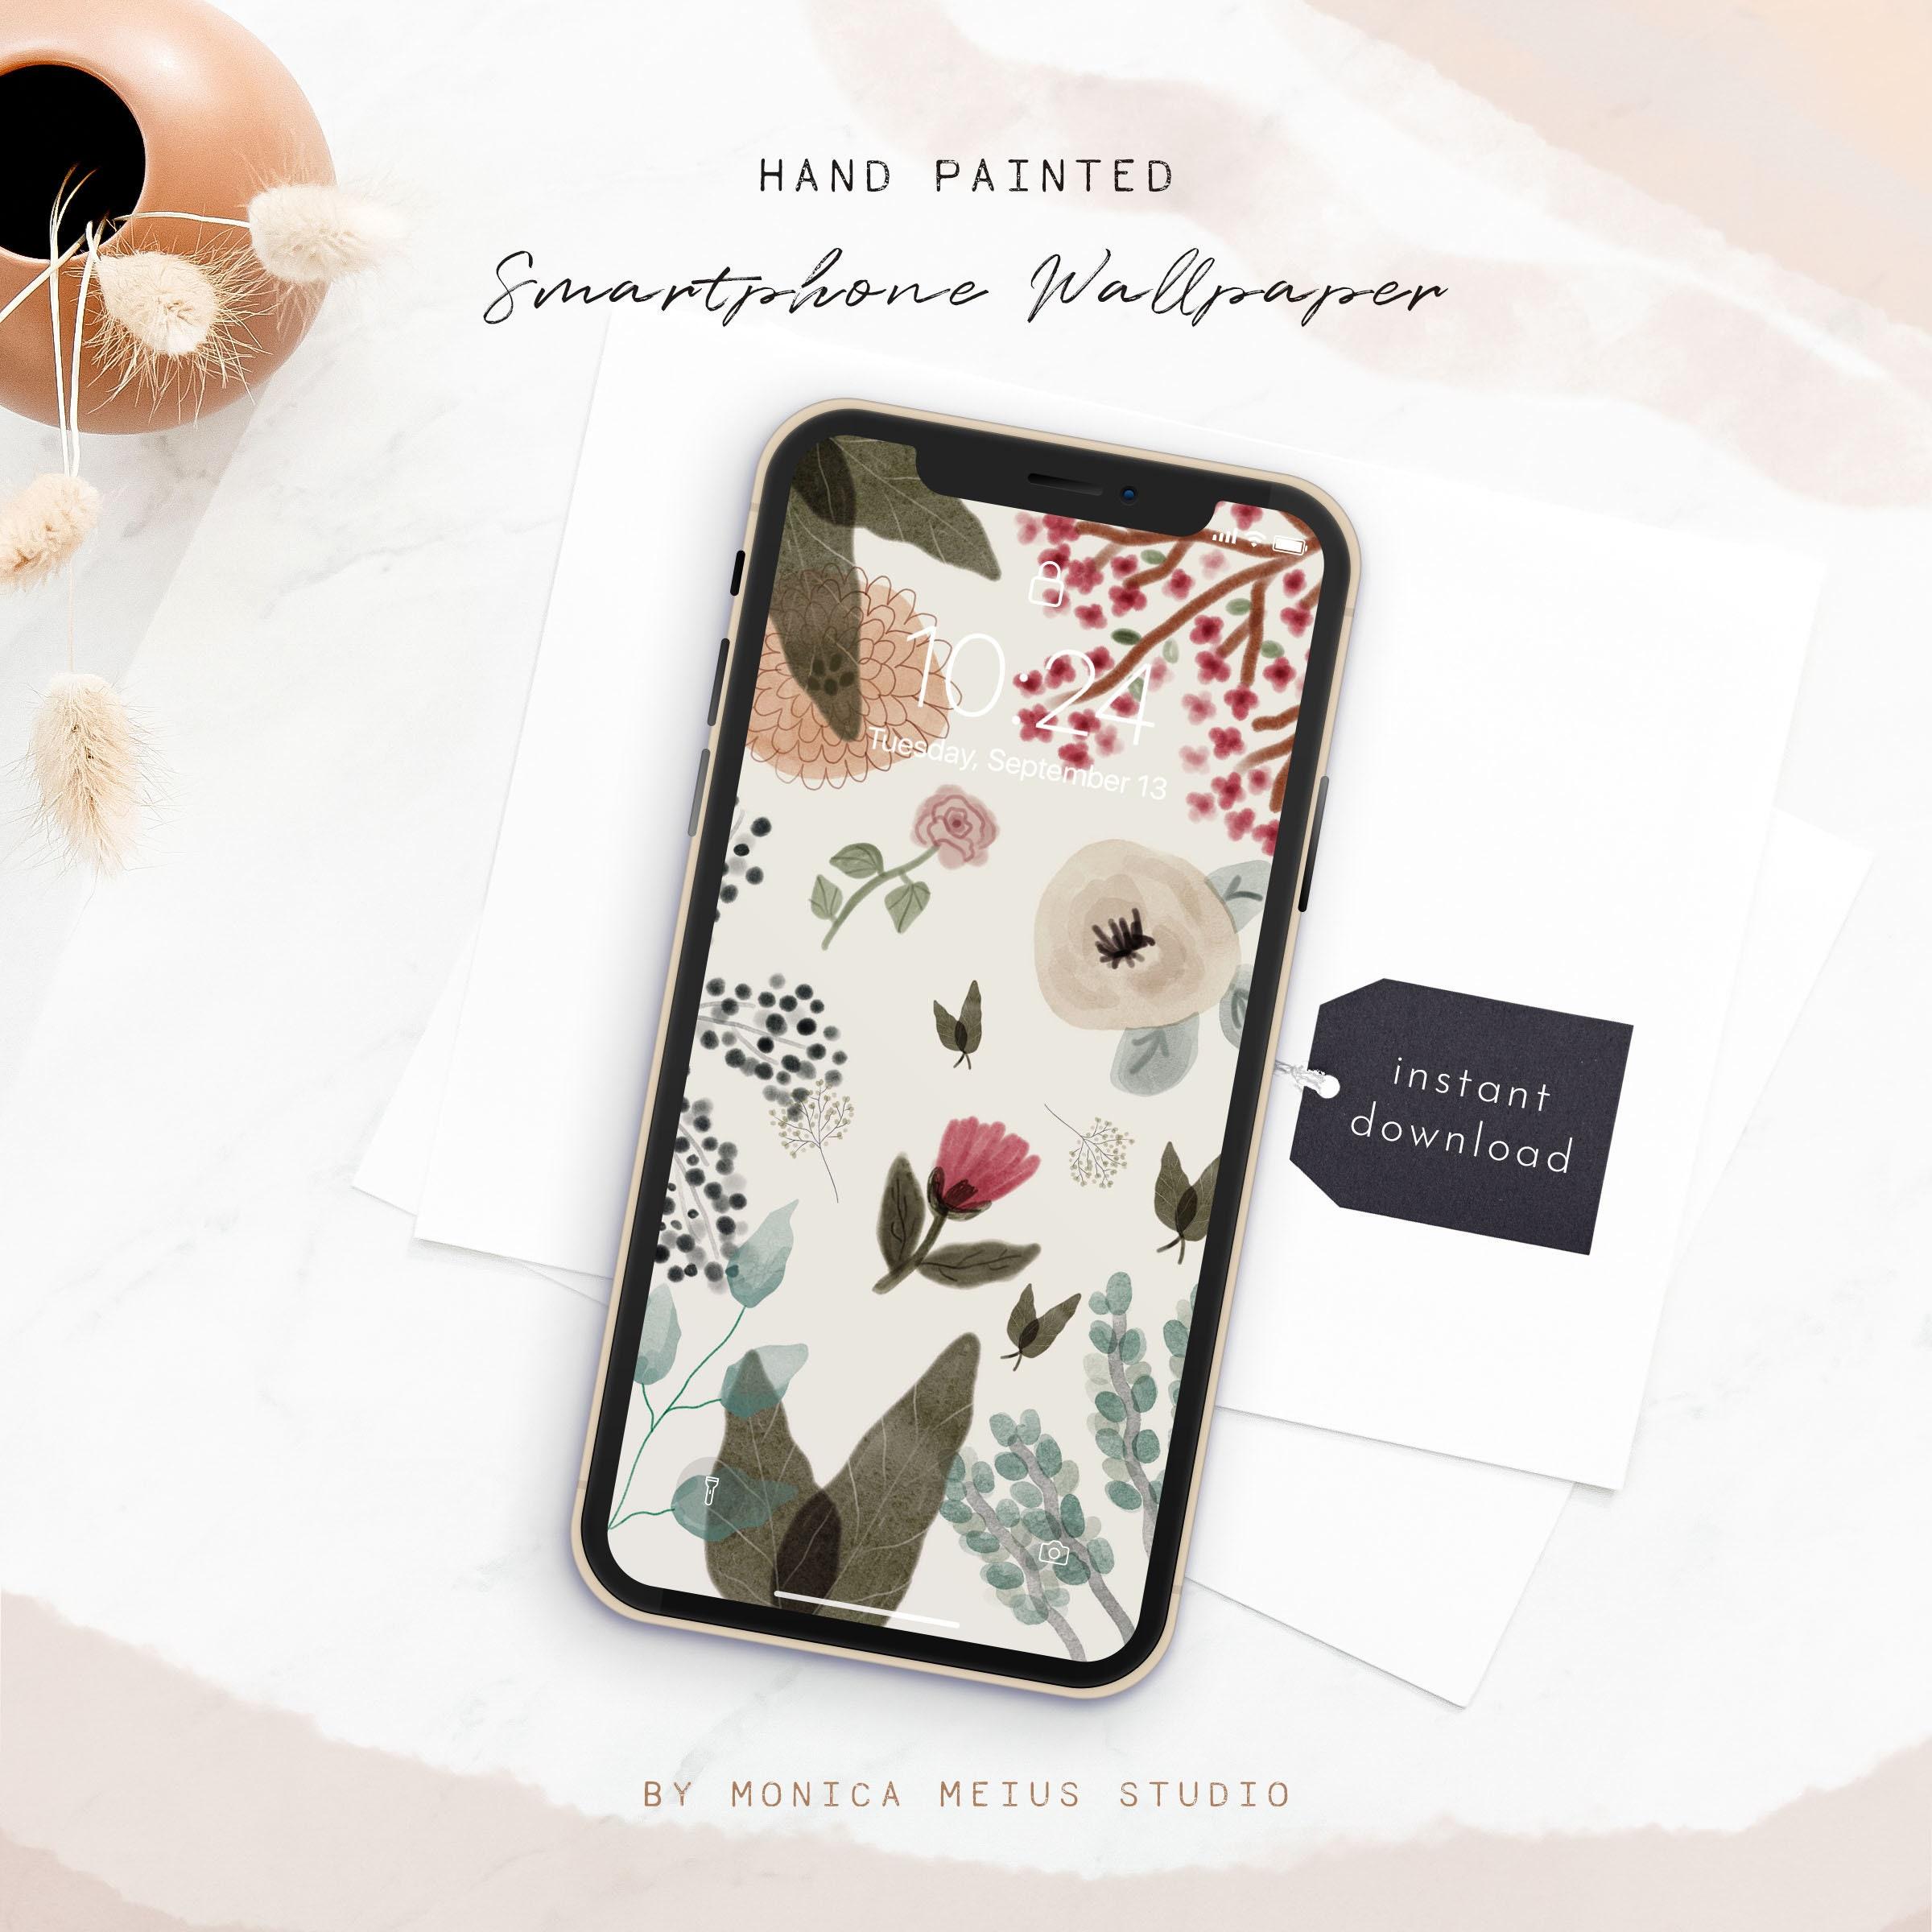 Botanical iPhone Wallpaper, floral smartphone Wallpaper, phone background,  Mobile Phone Wallpaper, iPhone background,Lock screen wallpaper